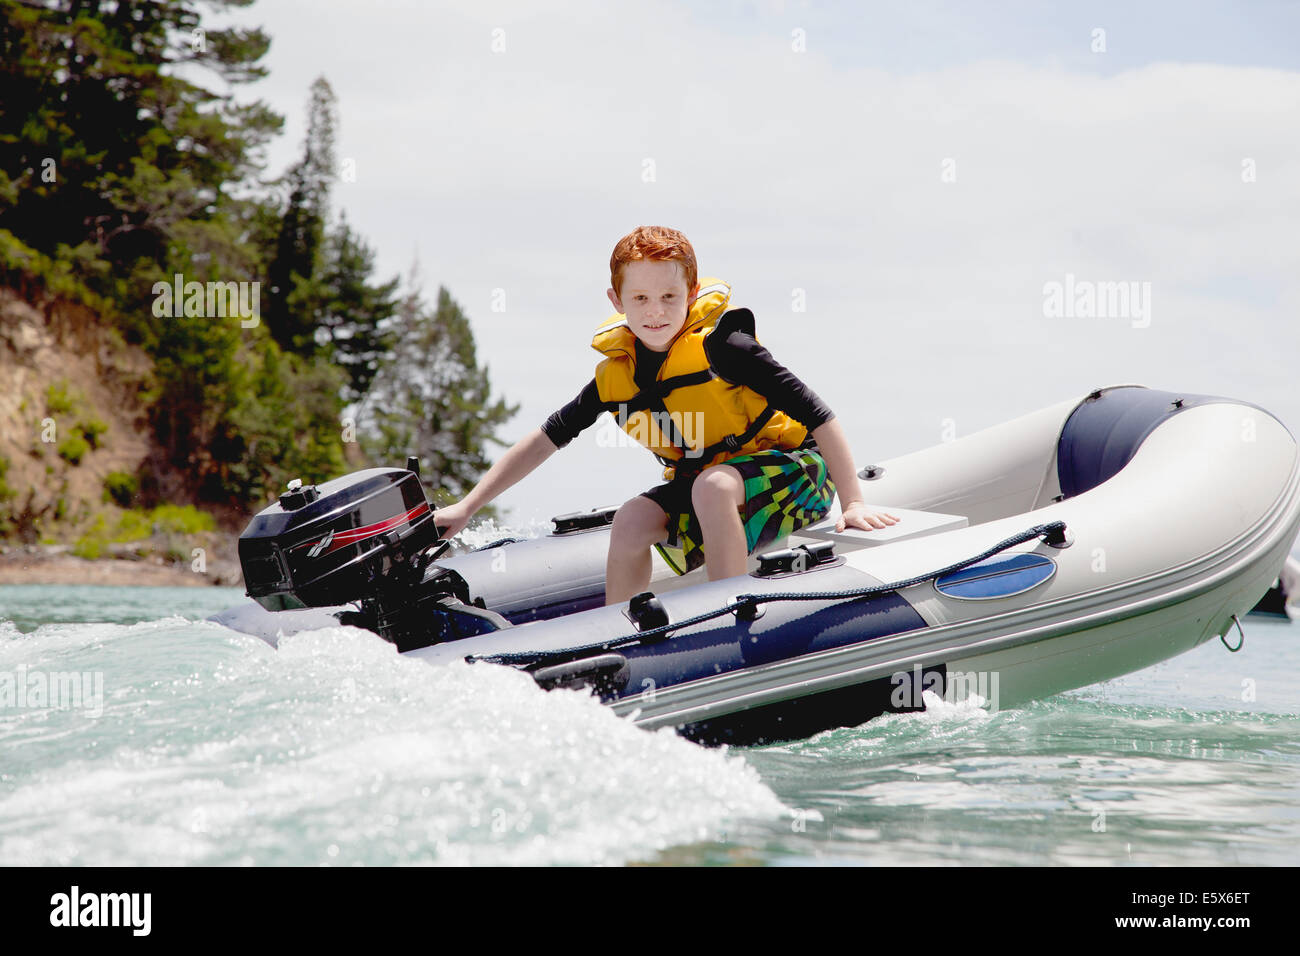 Boy steering speeding motor dinghy at sea - Stock Image